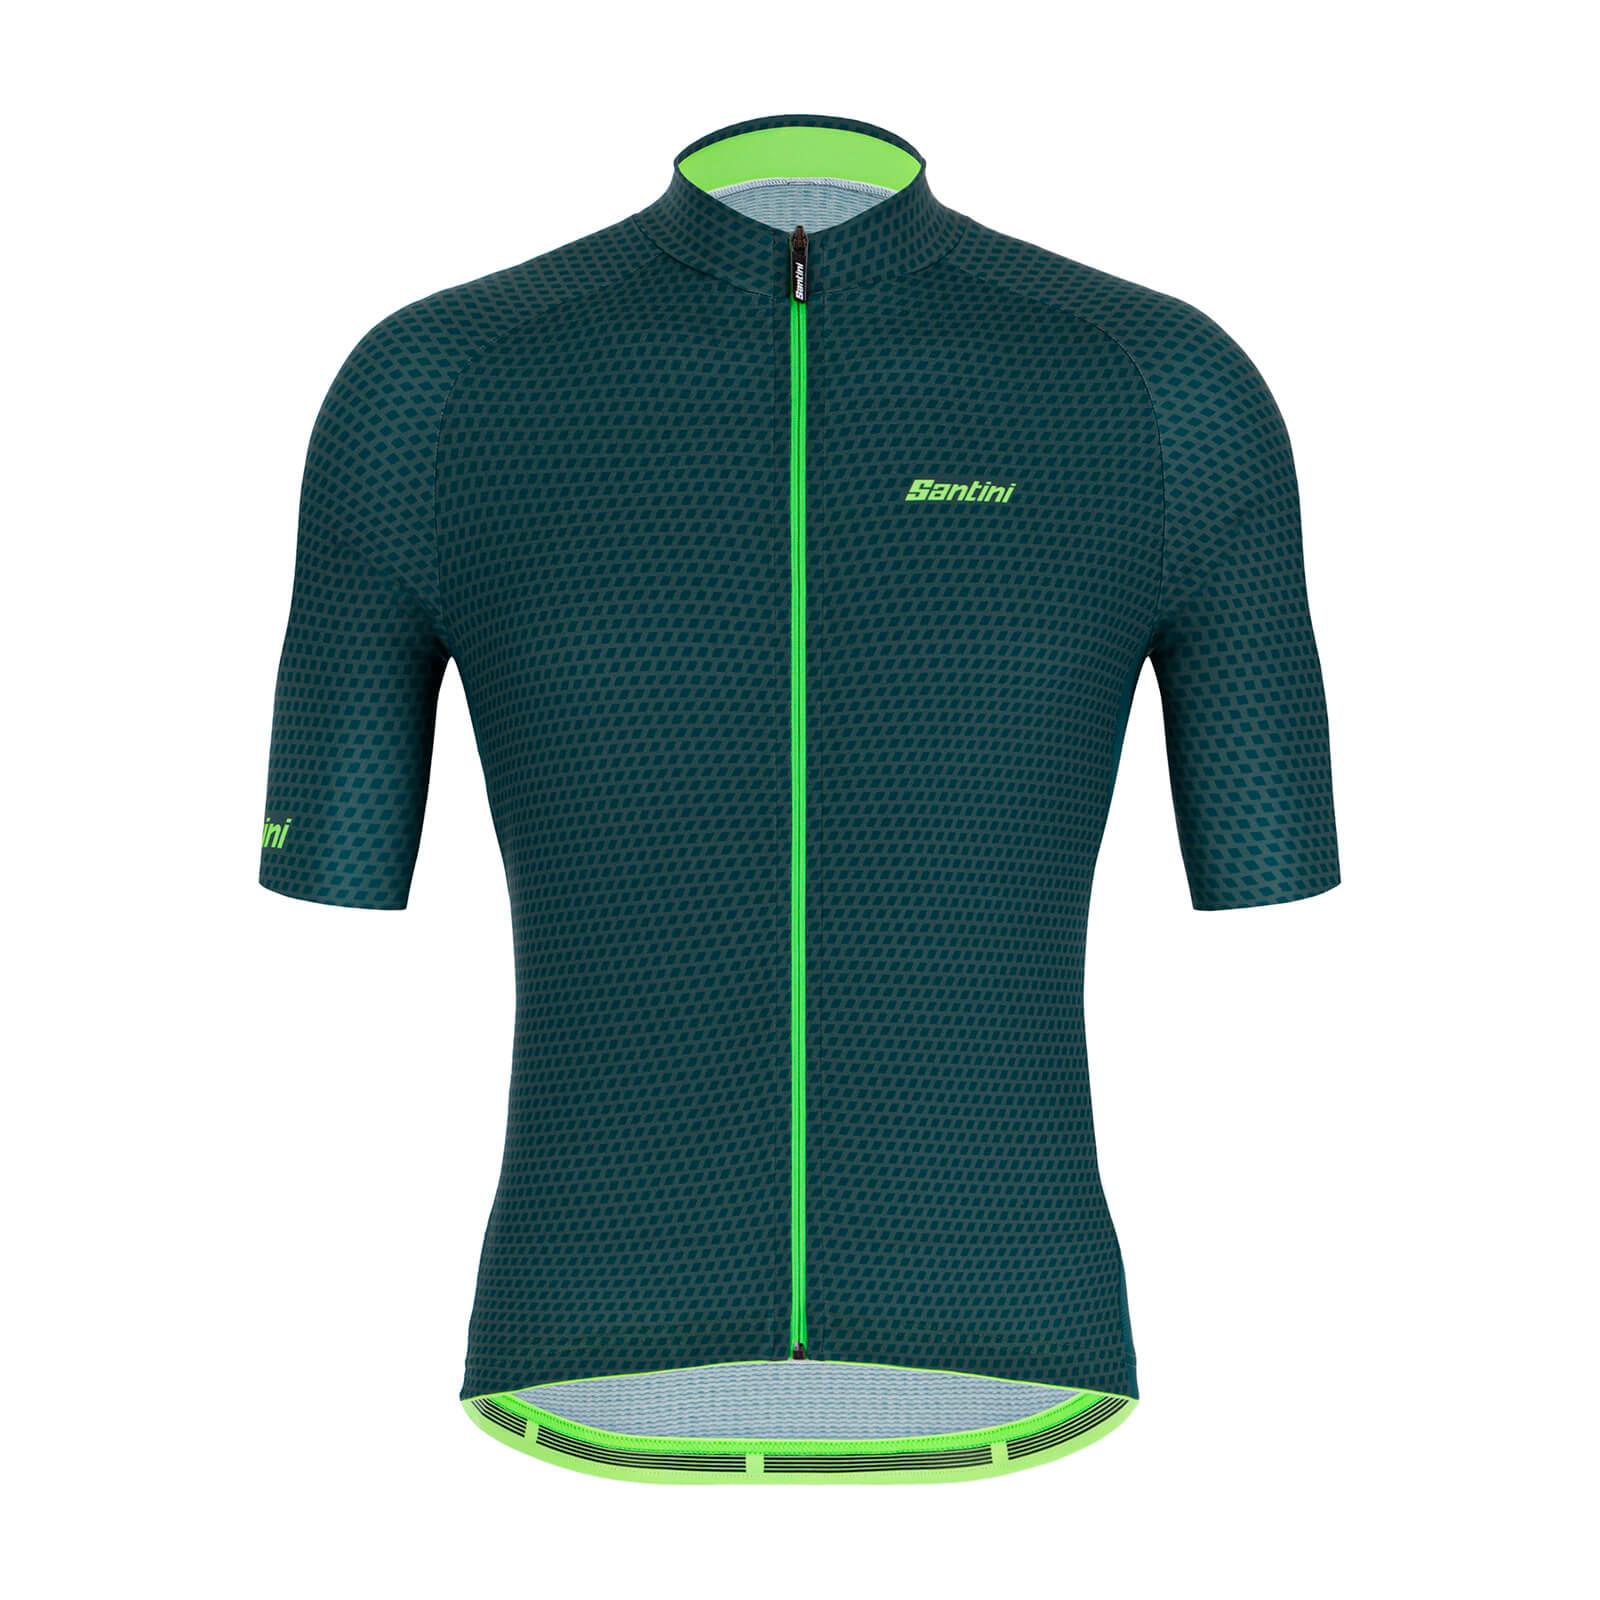 Santini Karma Kite Jersey - XL - Military Green